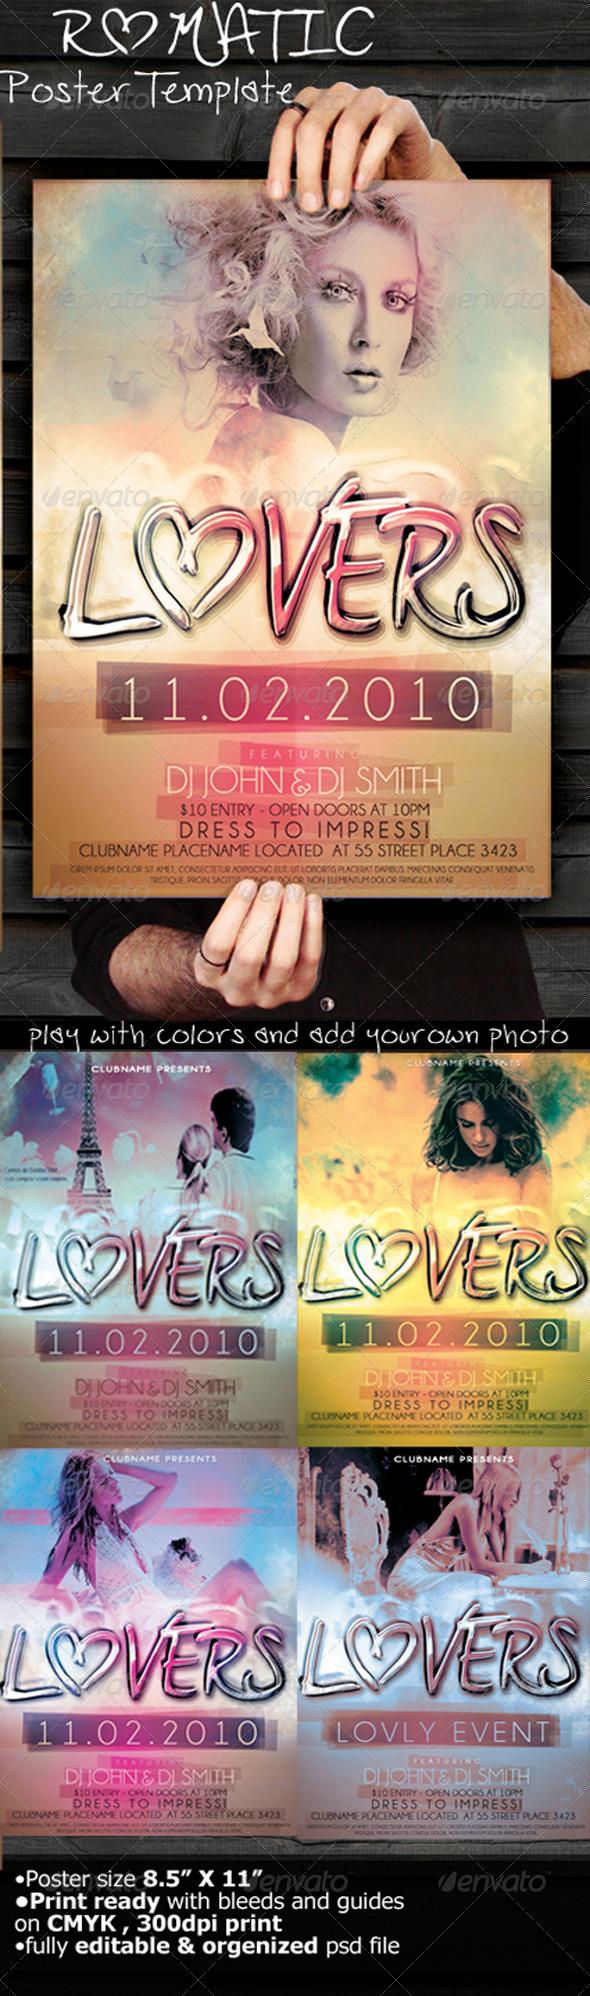 GraphicRiver Romantic Poster Template 164375